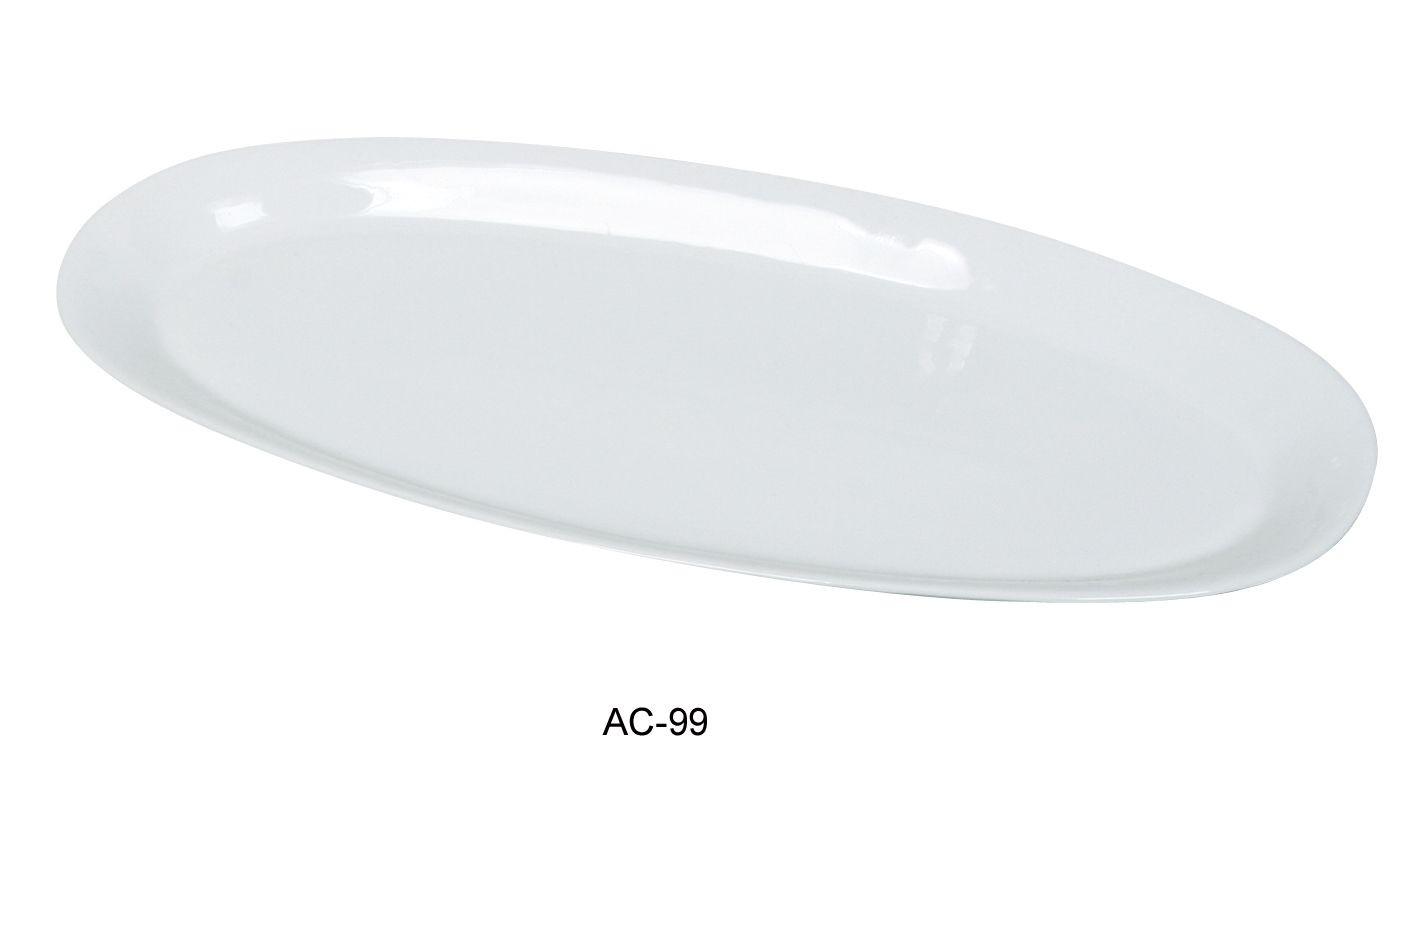 "Yanco ac-99 Abco 23"" x 10 1/4"" x 2"" Fishia Platter"